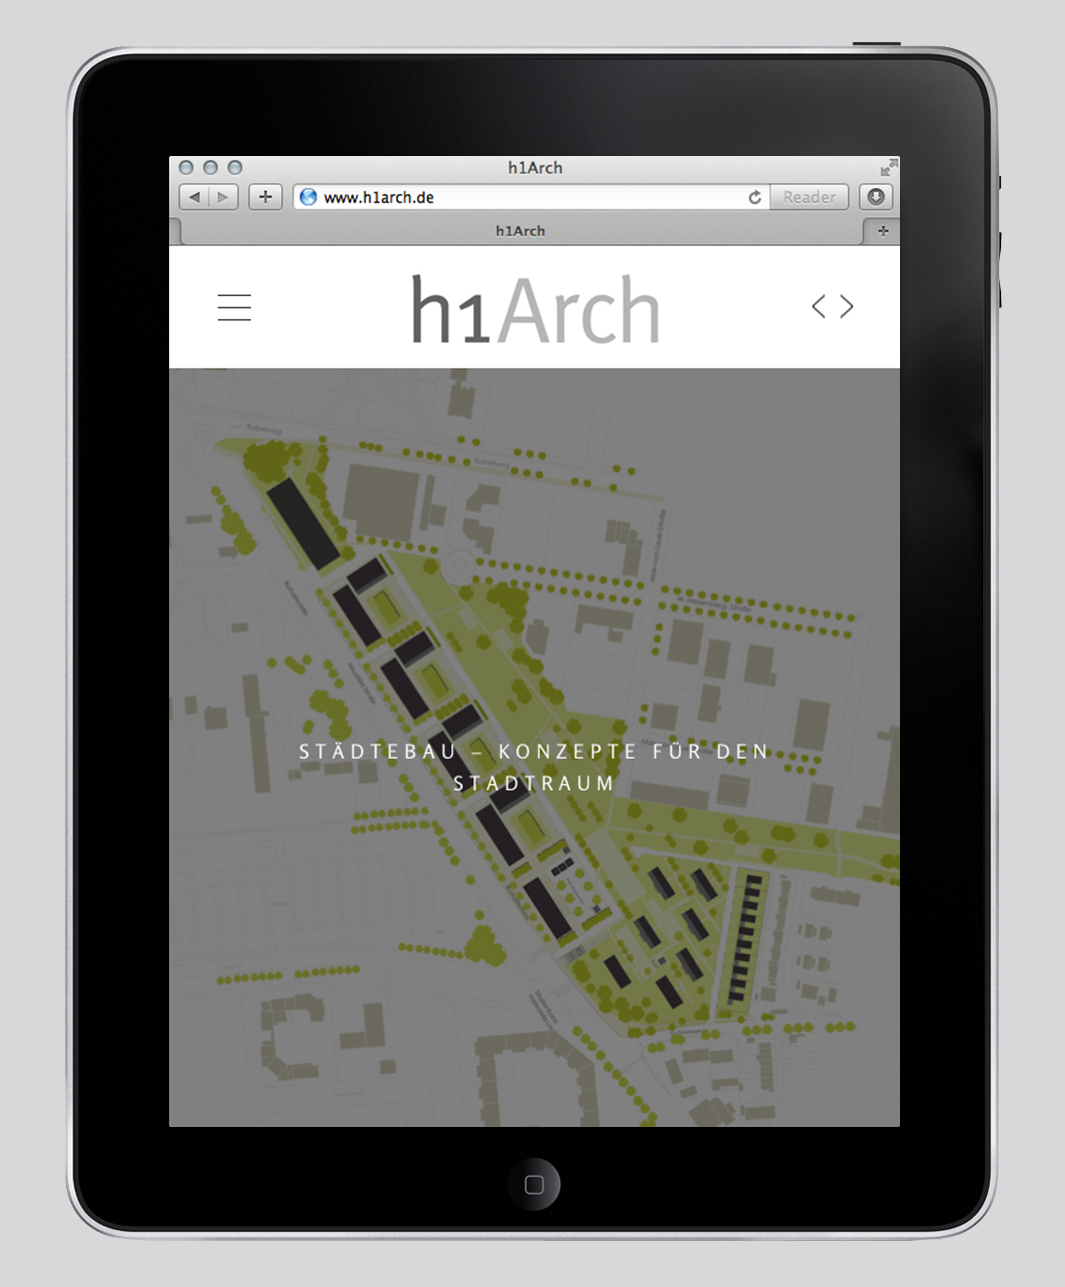 h1Arch_01.jpg